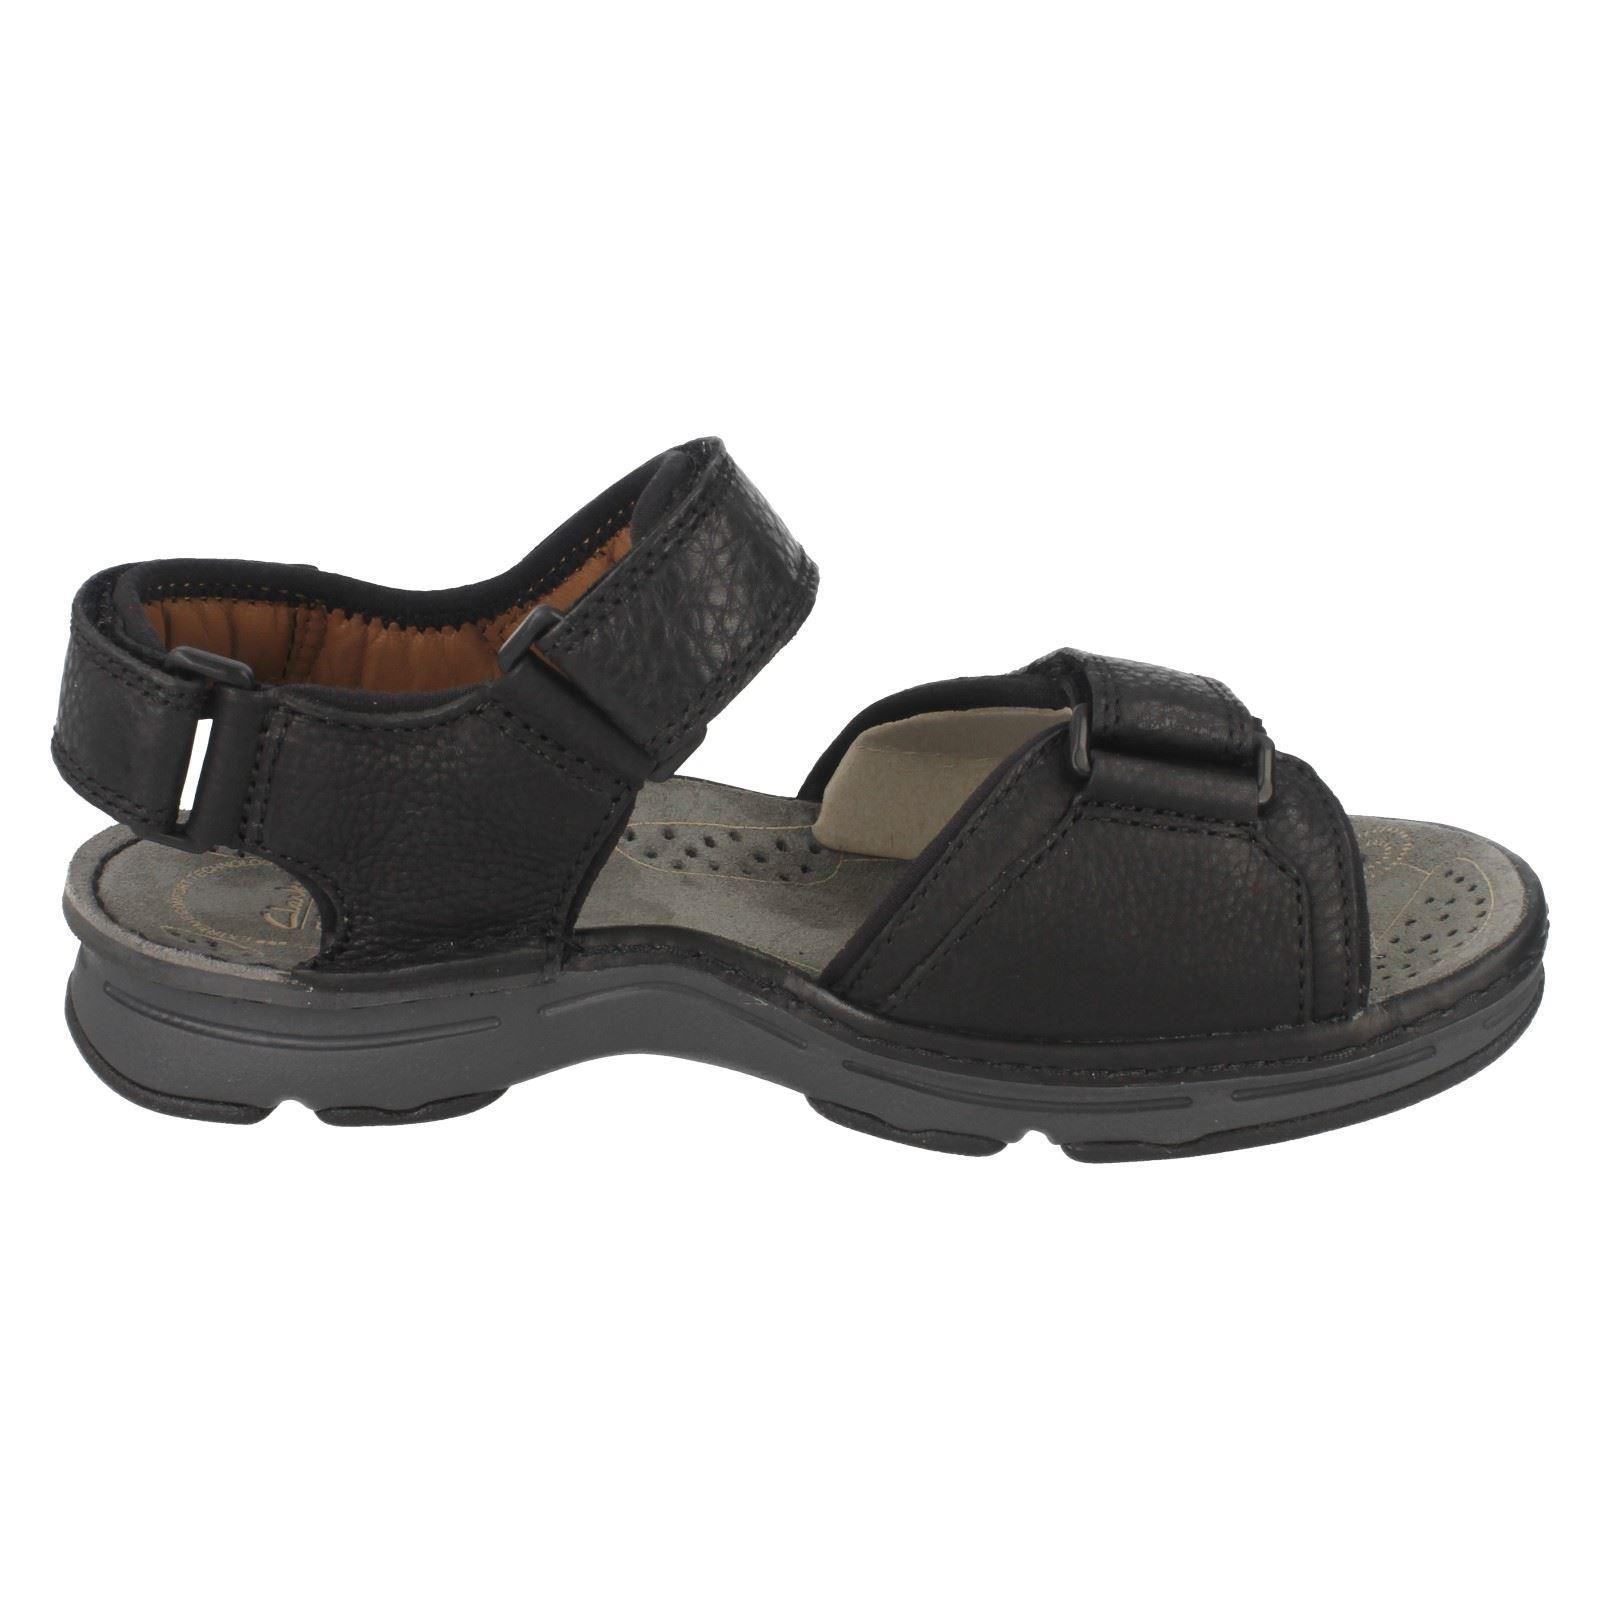 23a0ab01a1f Clarks-Mens-Active-Air-Sandals-Atl-Part thumbnail 7